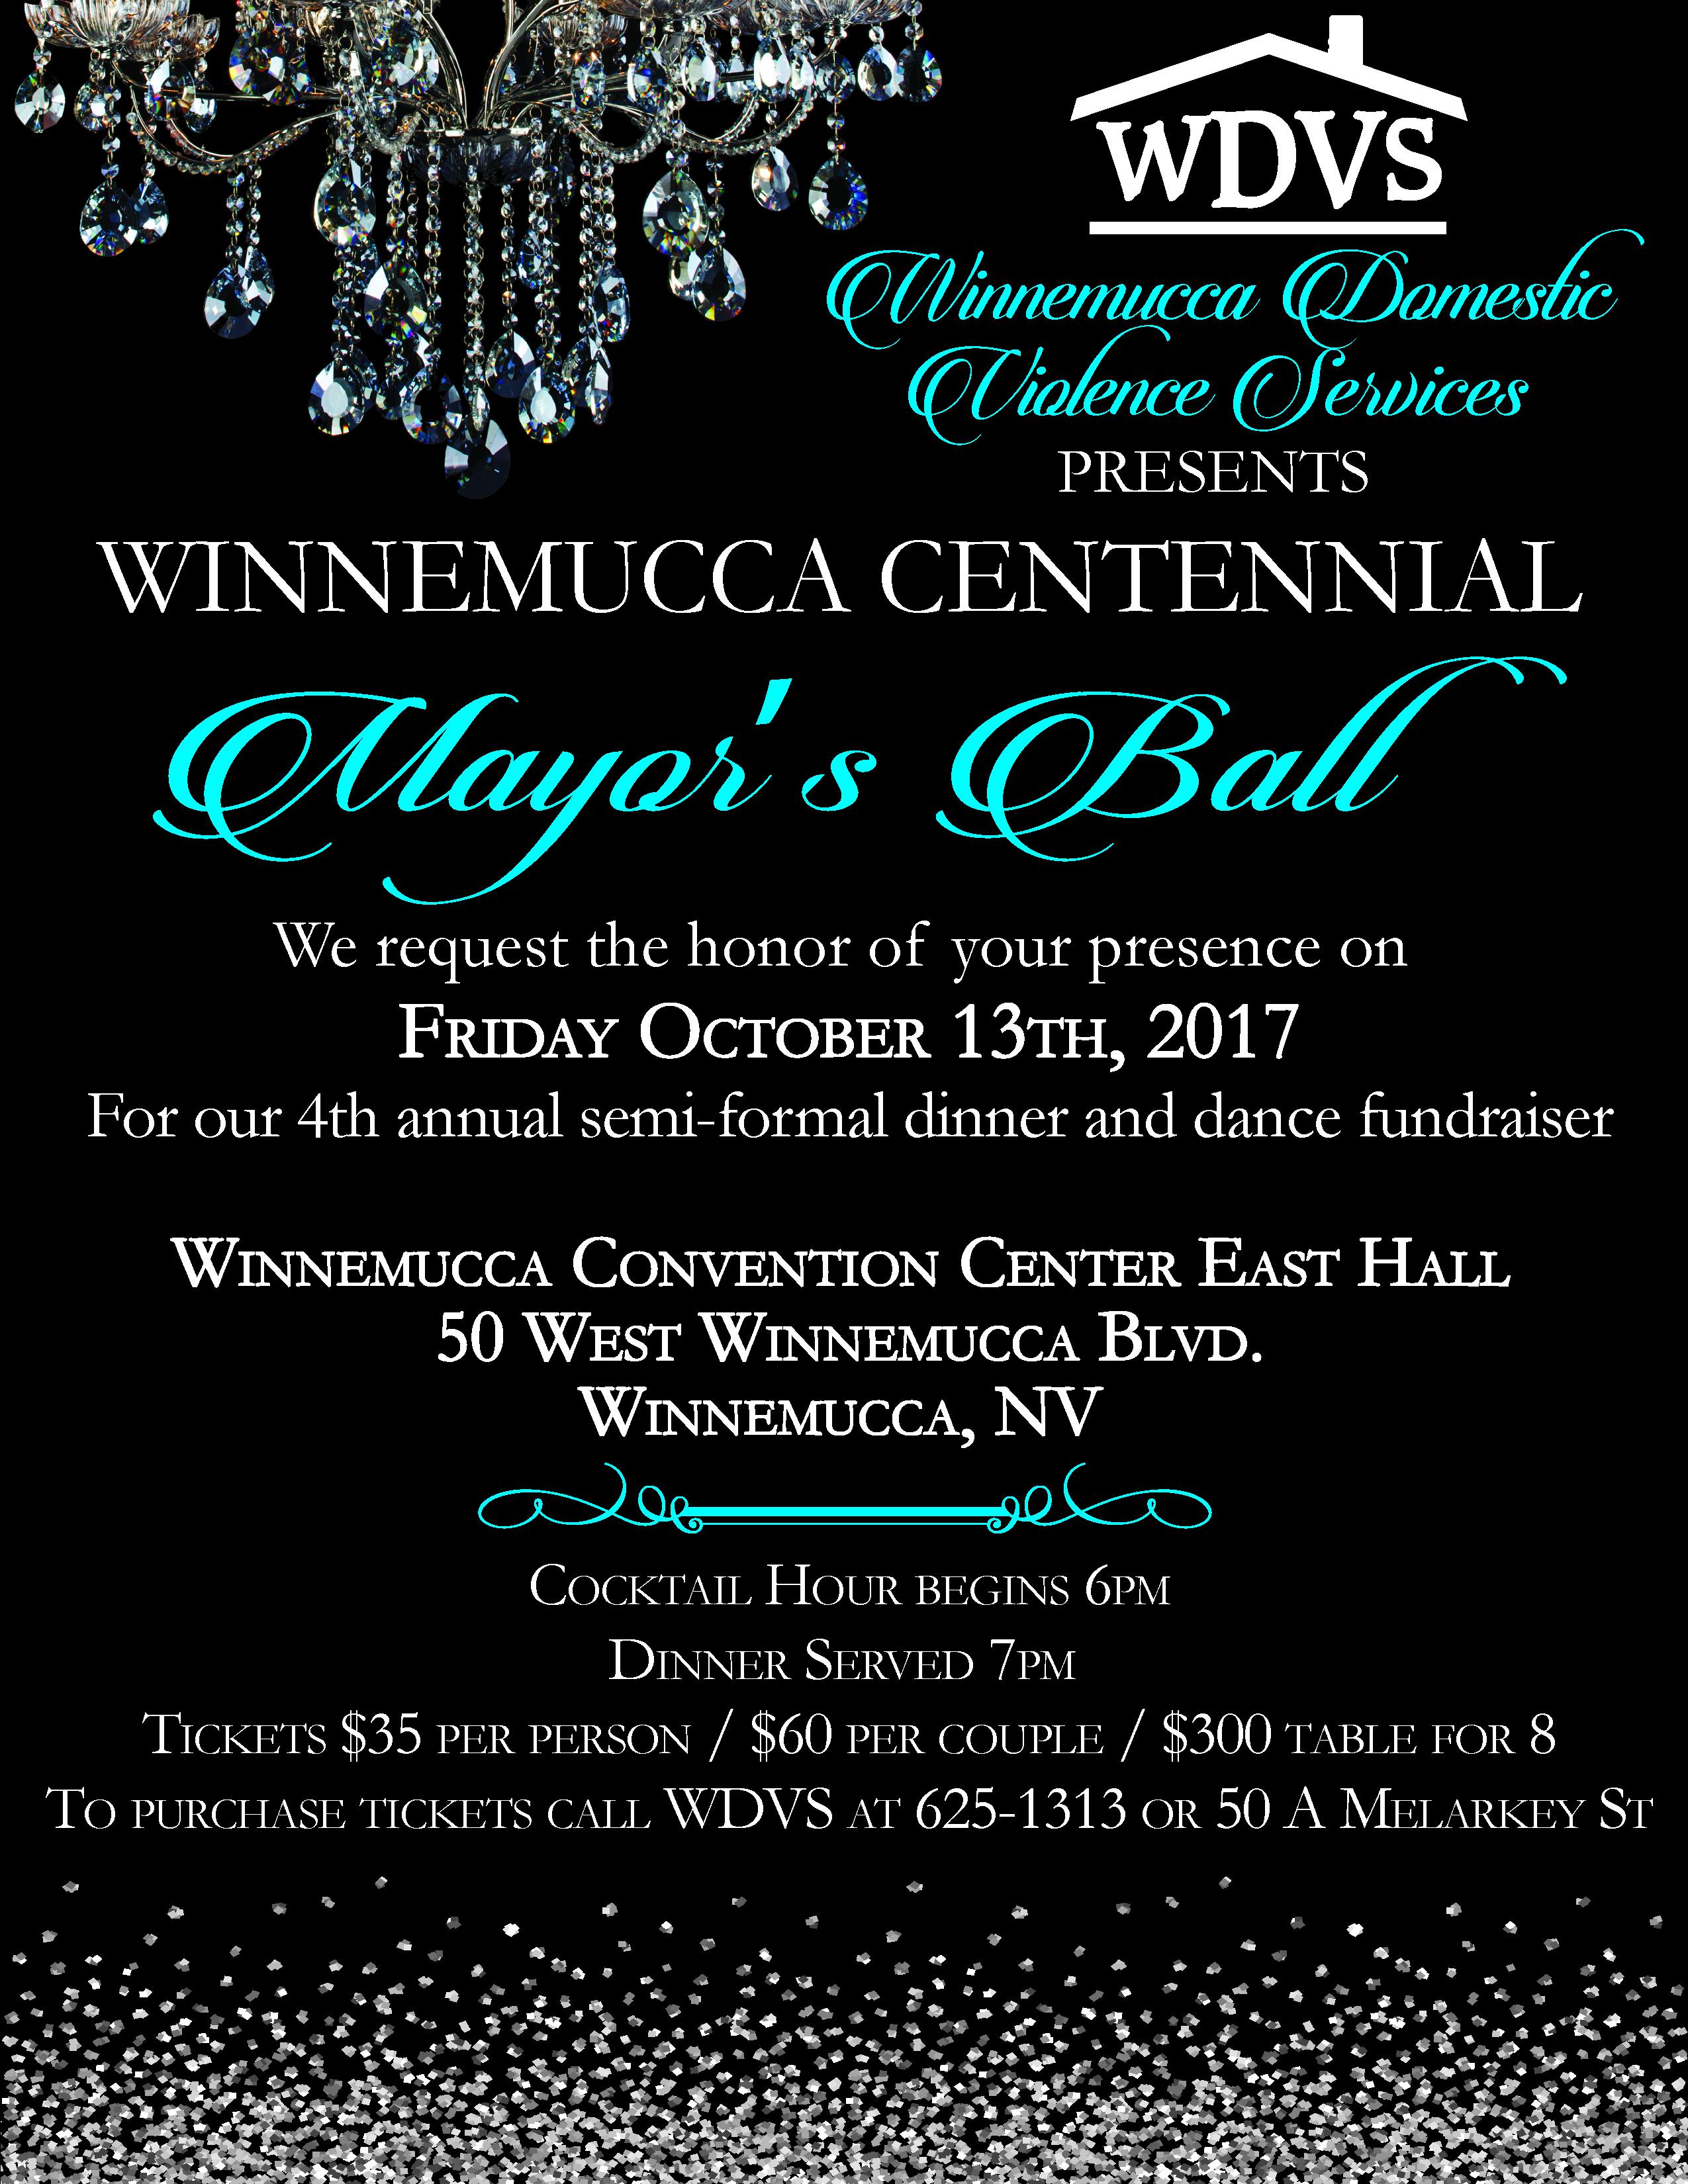 WDVS Mayor's Ball 2017 8.5X11 2017 Flyer -01 (1)